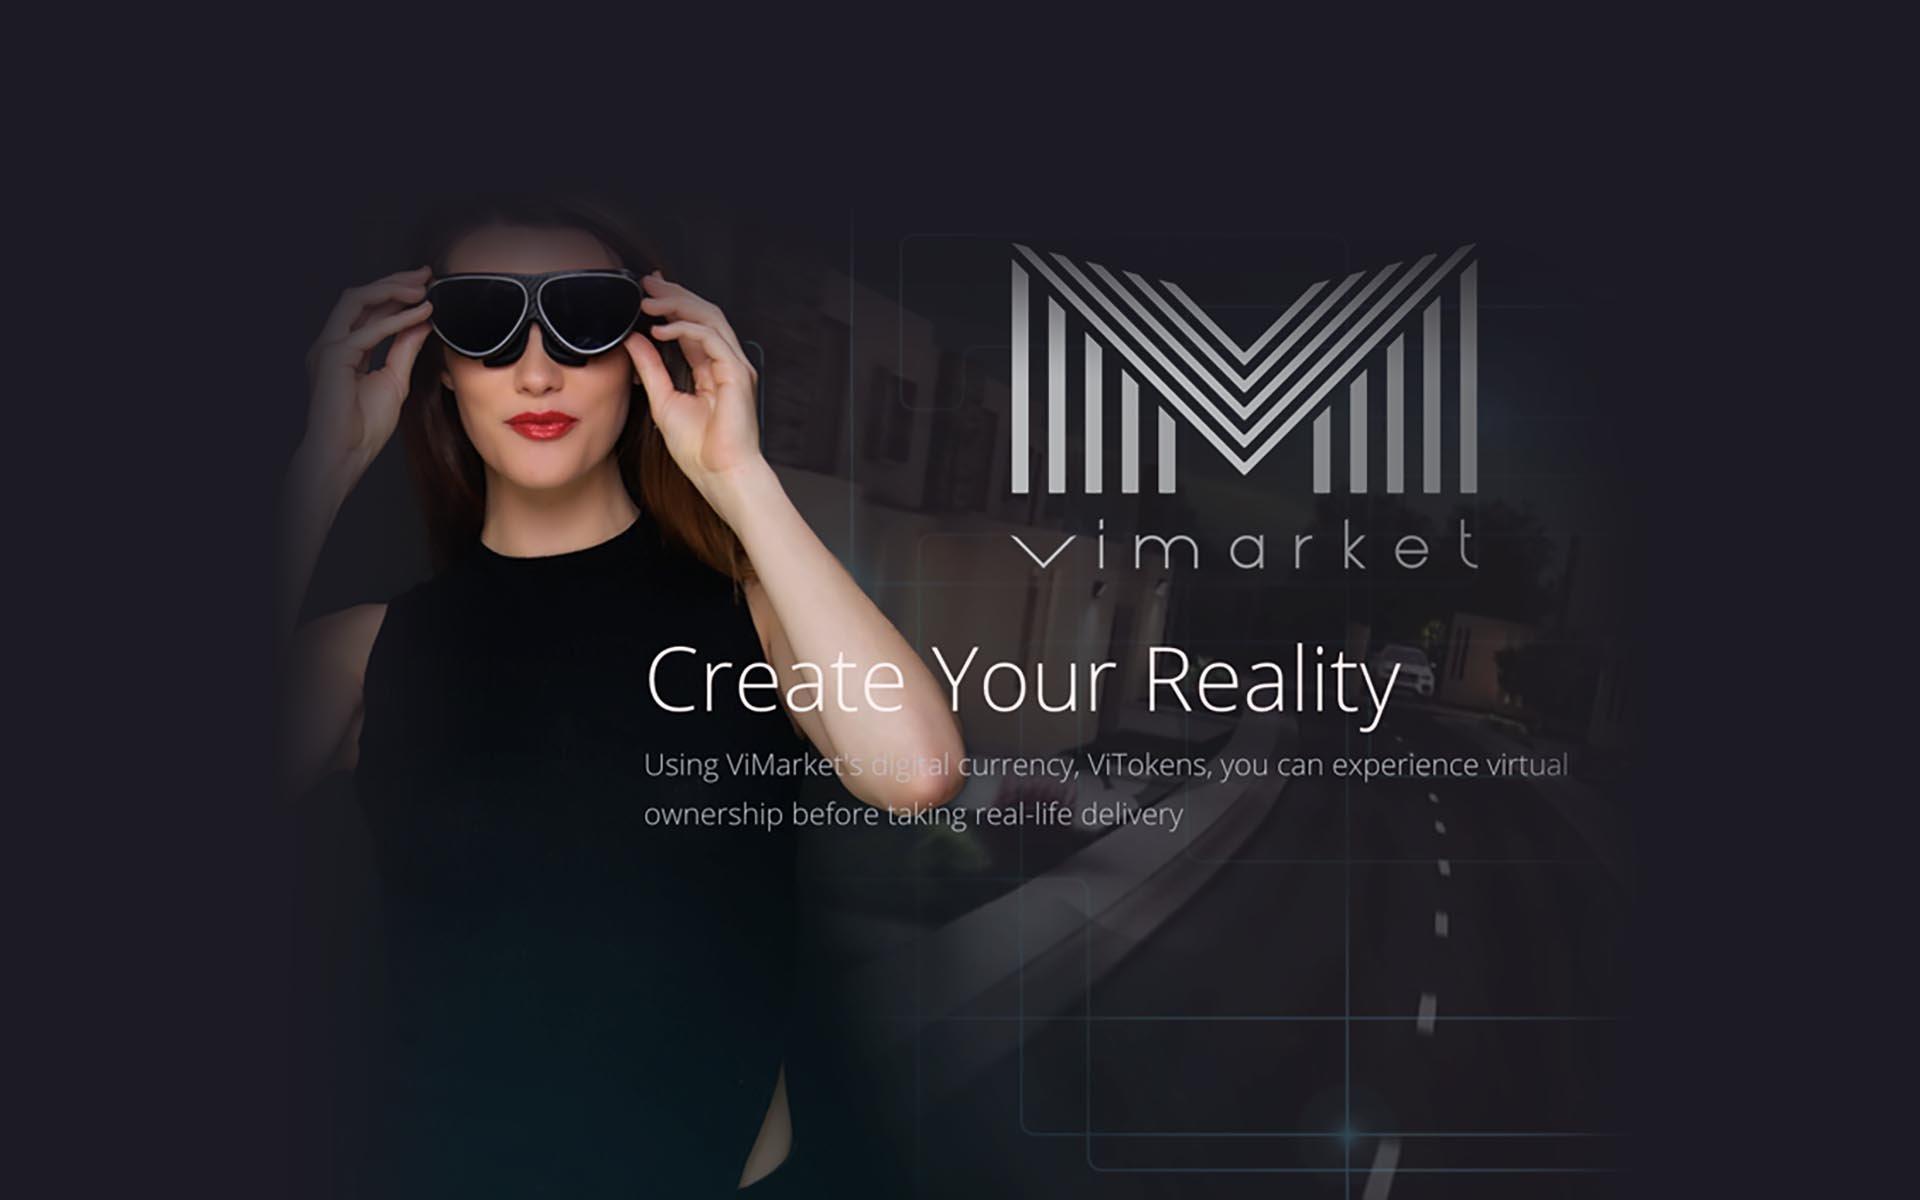 E-Commerce Gamechanger ViMarket Announces the Start of its ViTokens Pre-Sale